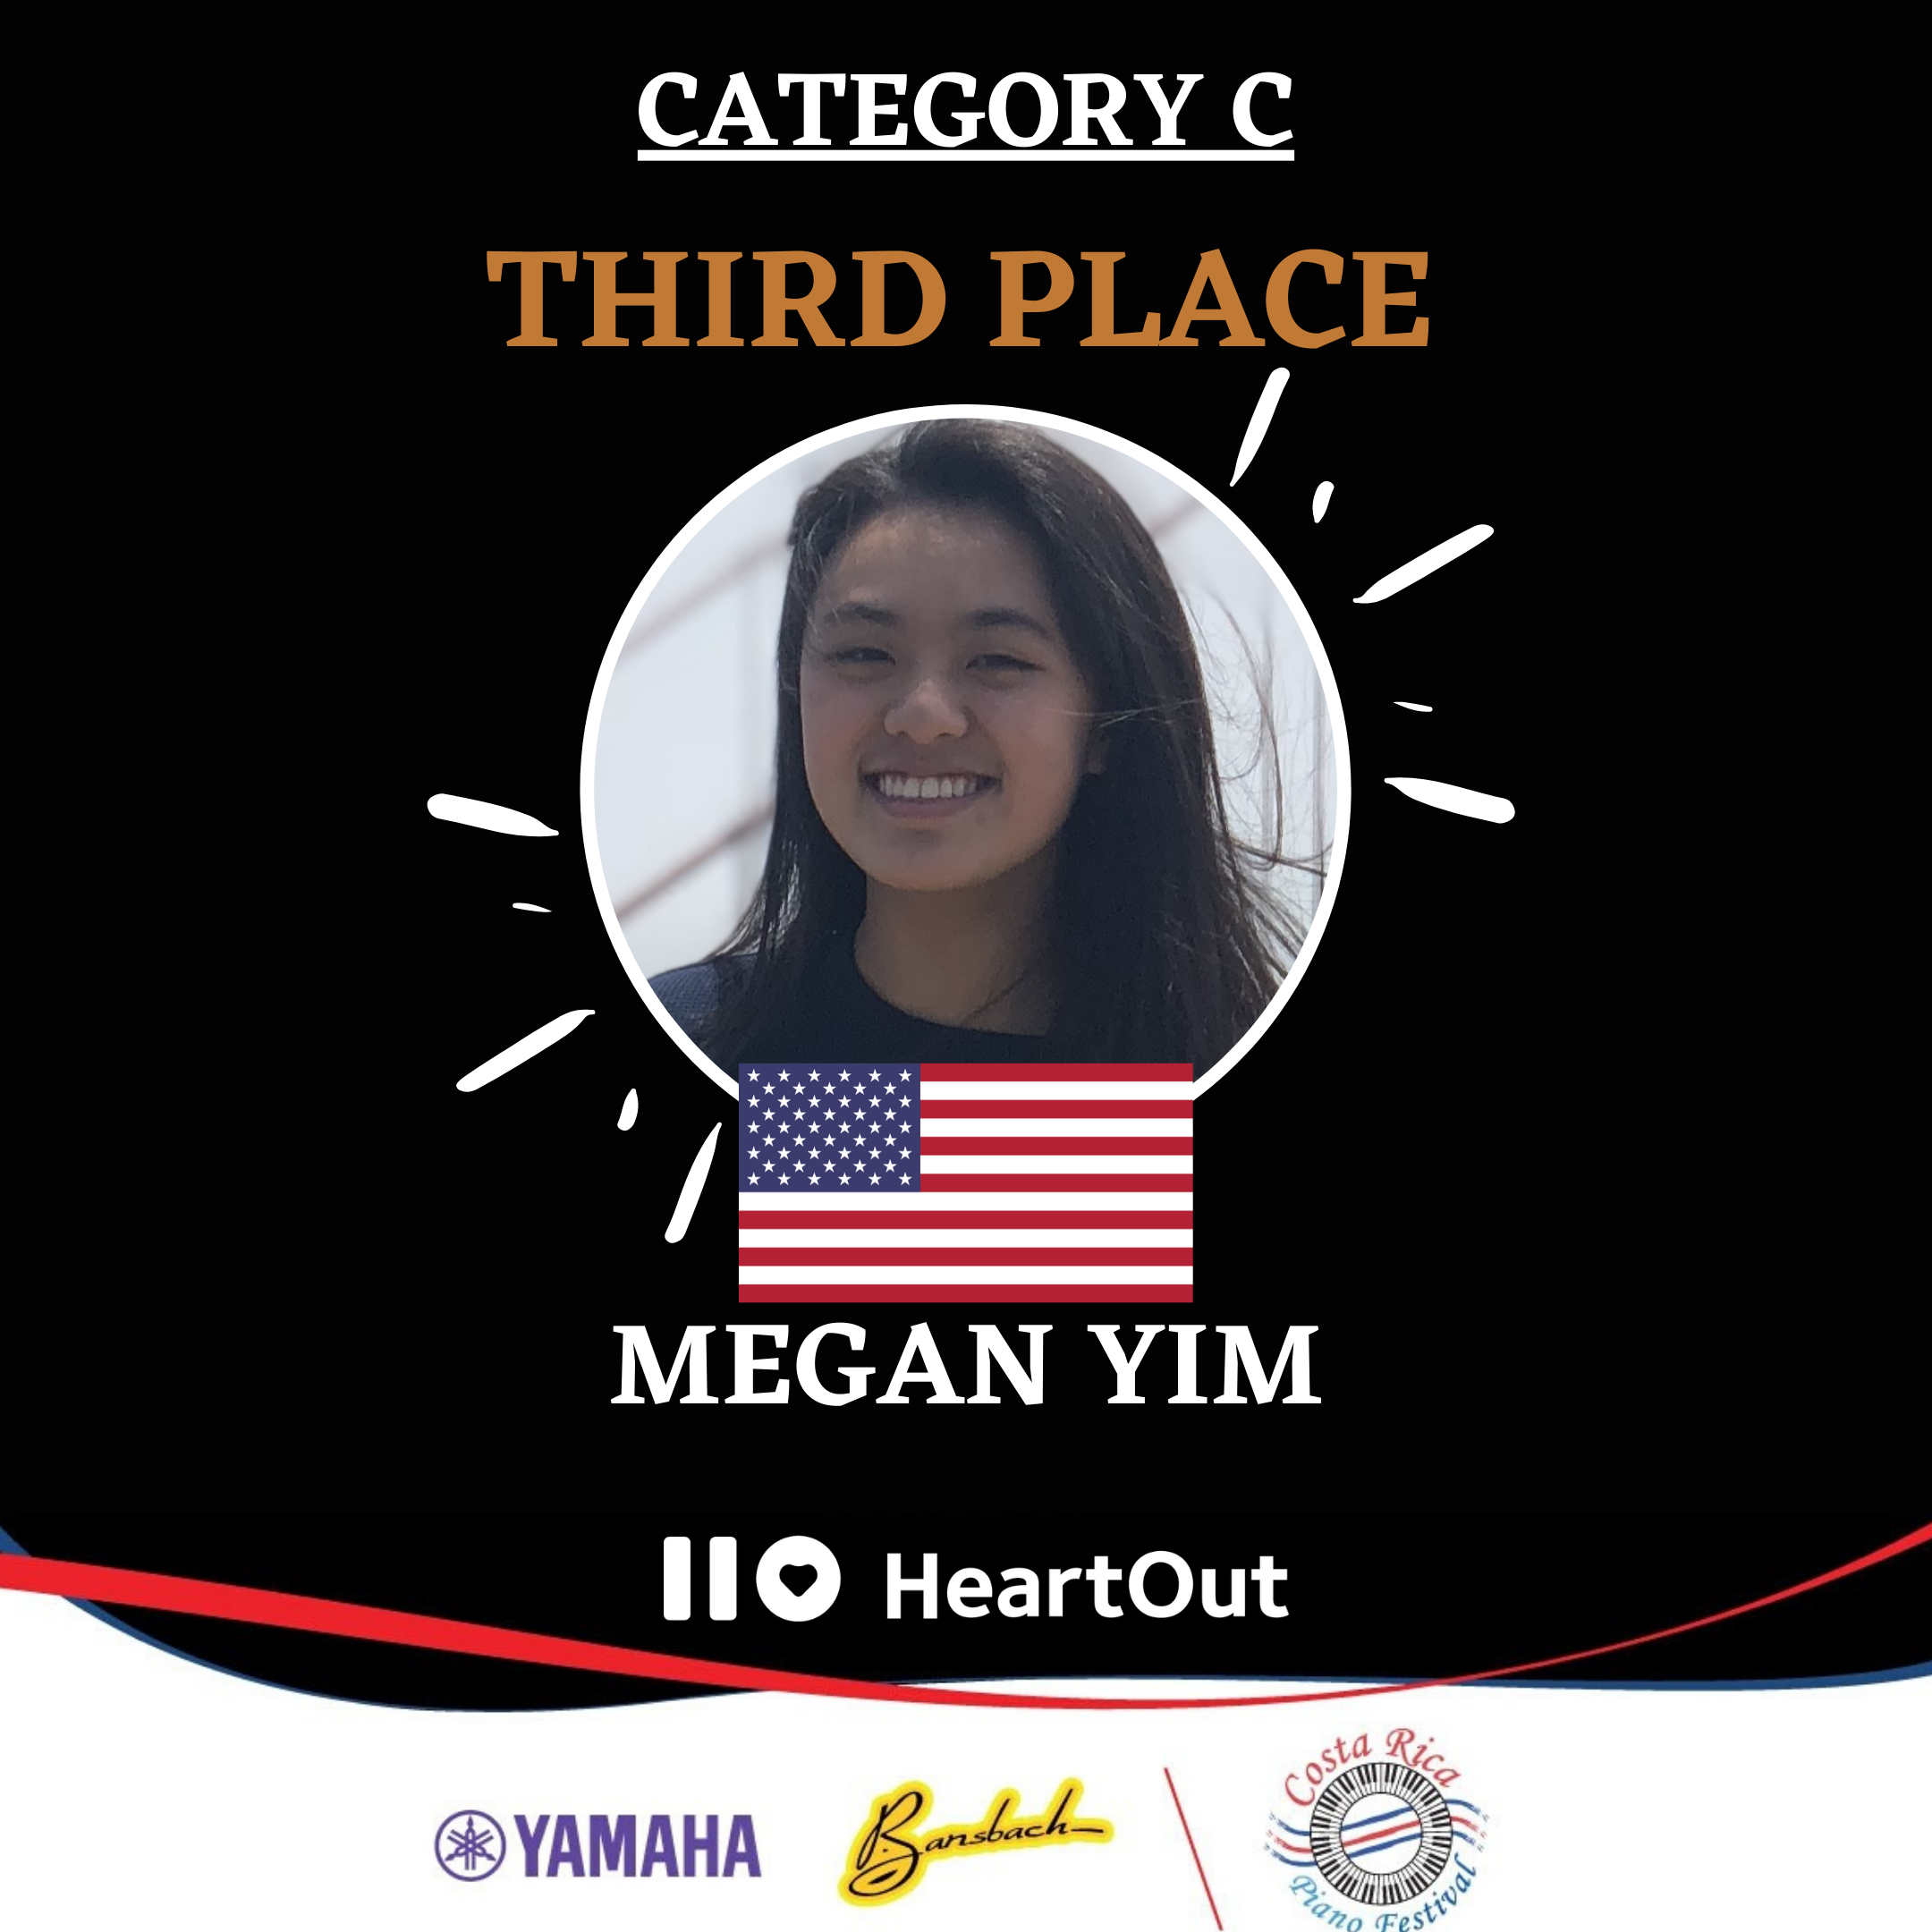 CRPF Megan Yim